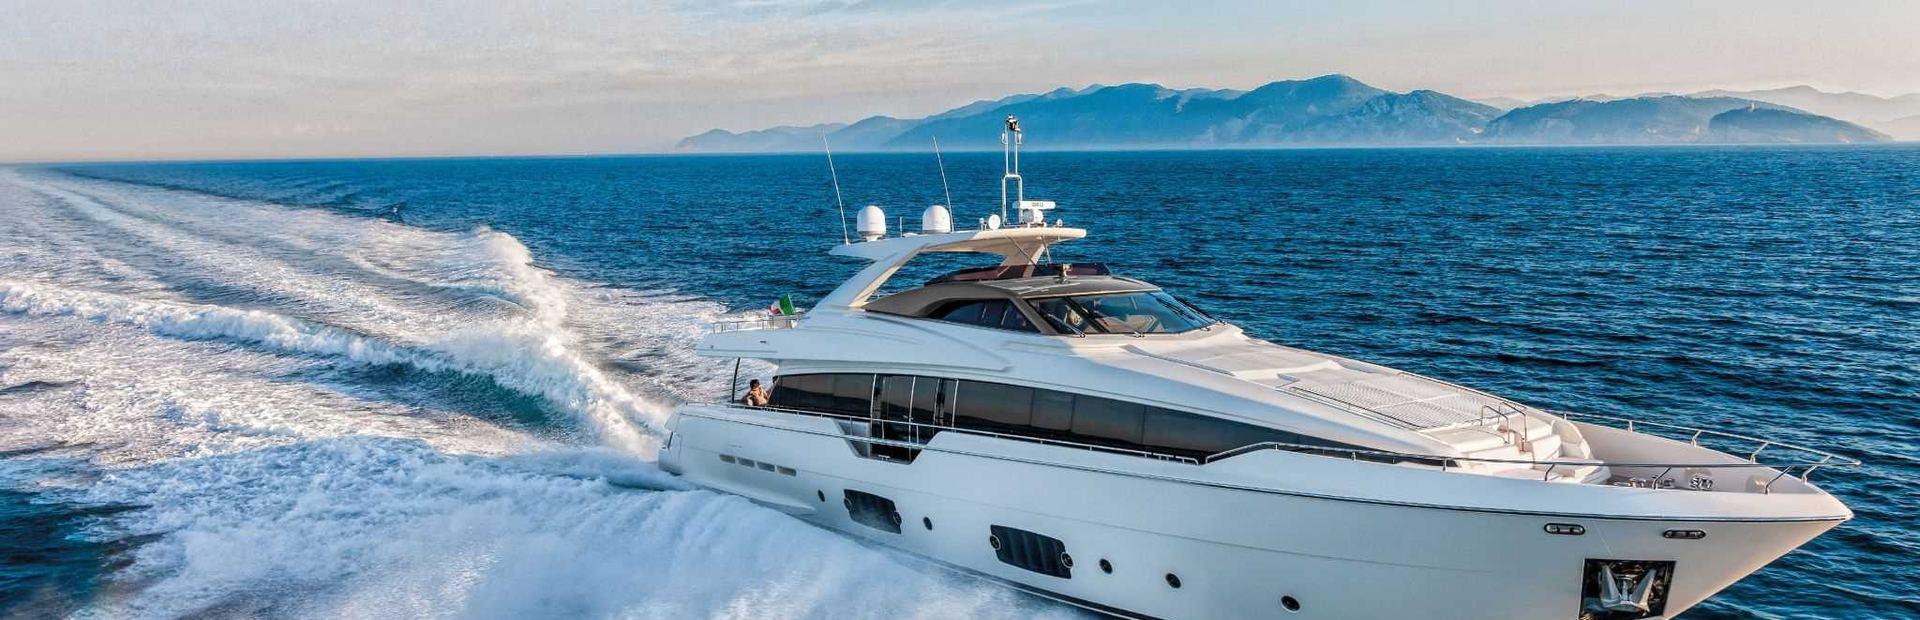 Ferretti Yachts 960 Yacht Charter